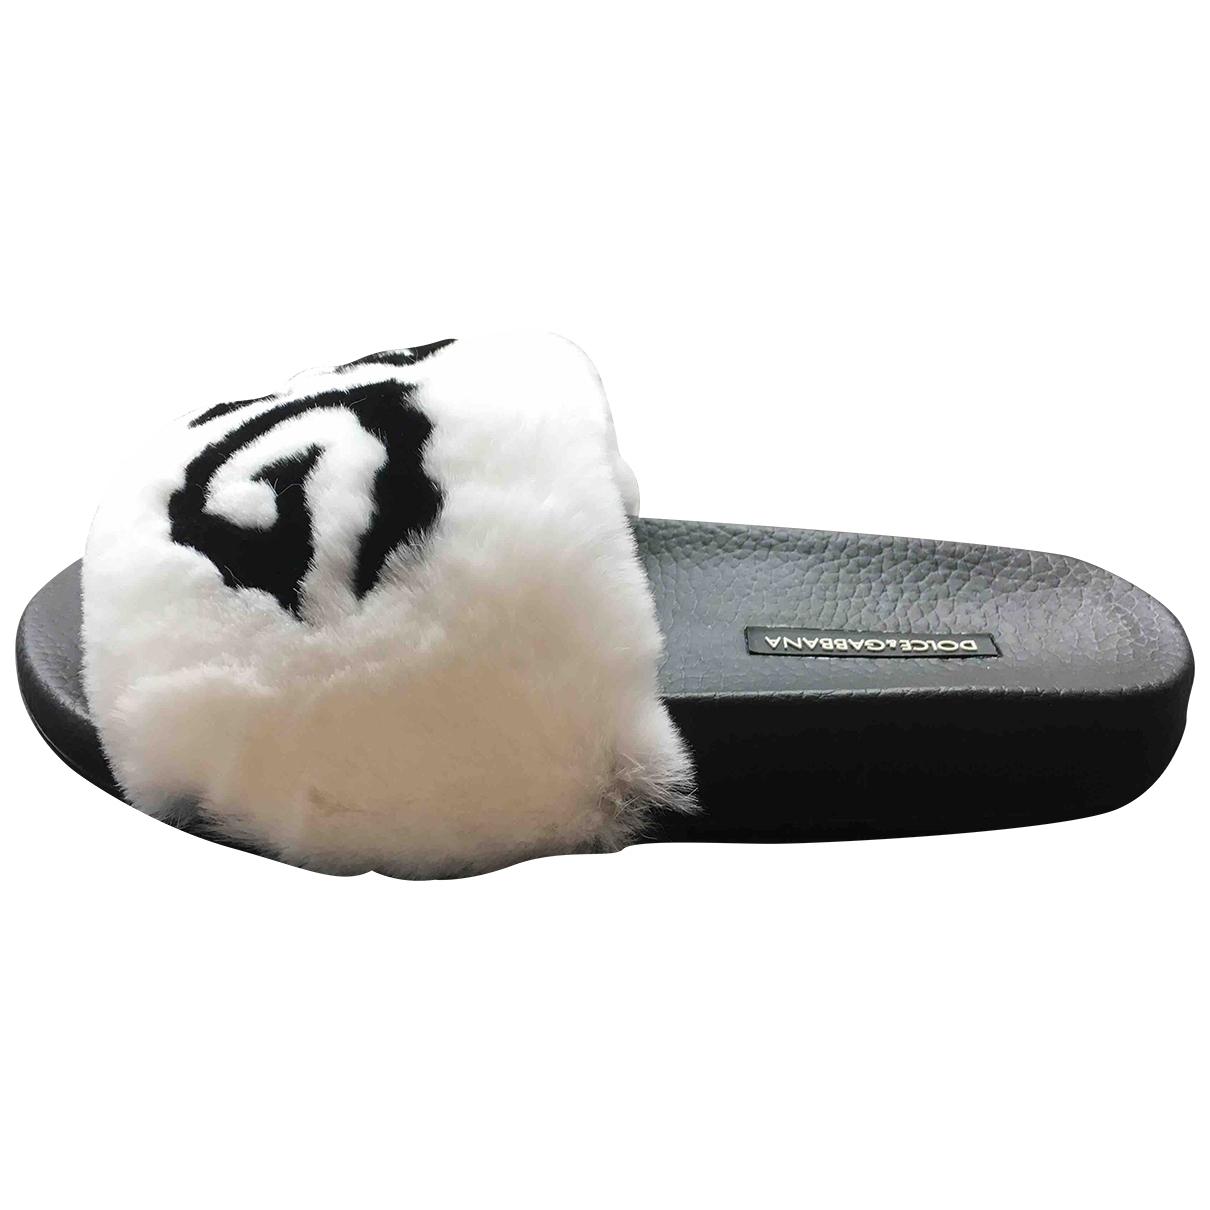 Dolce & Gabbana \N Black Rabbit Sandals for Women 36 EU